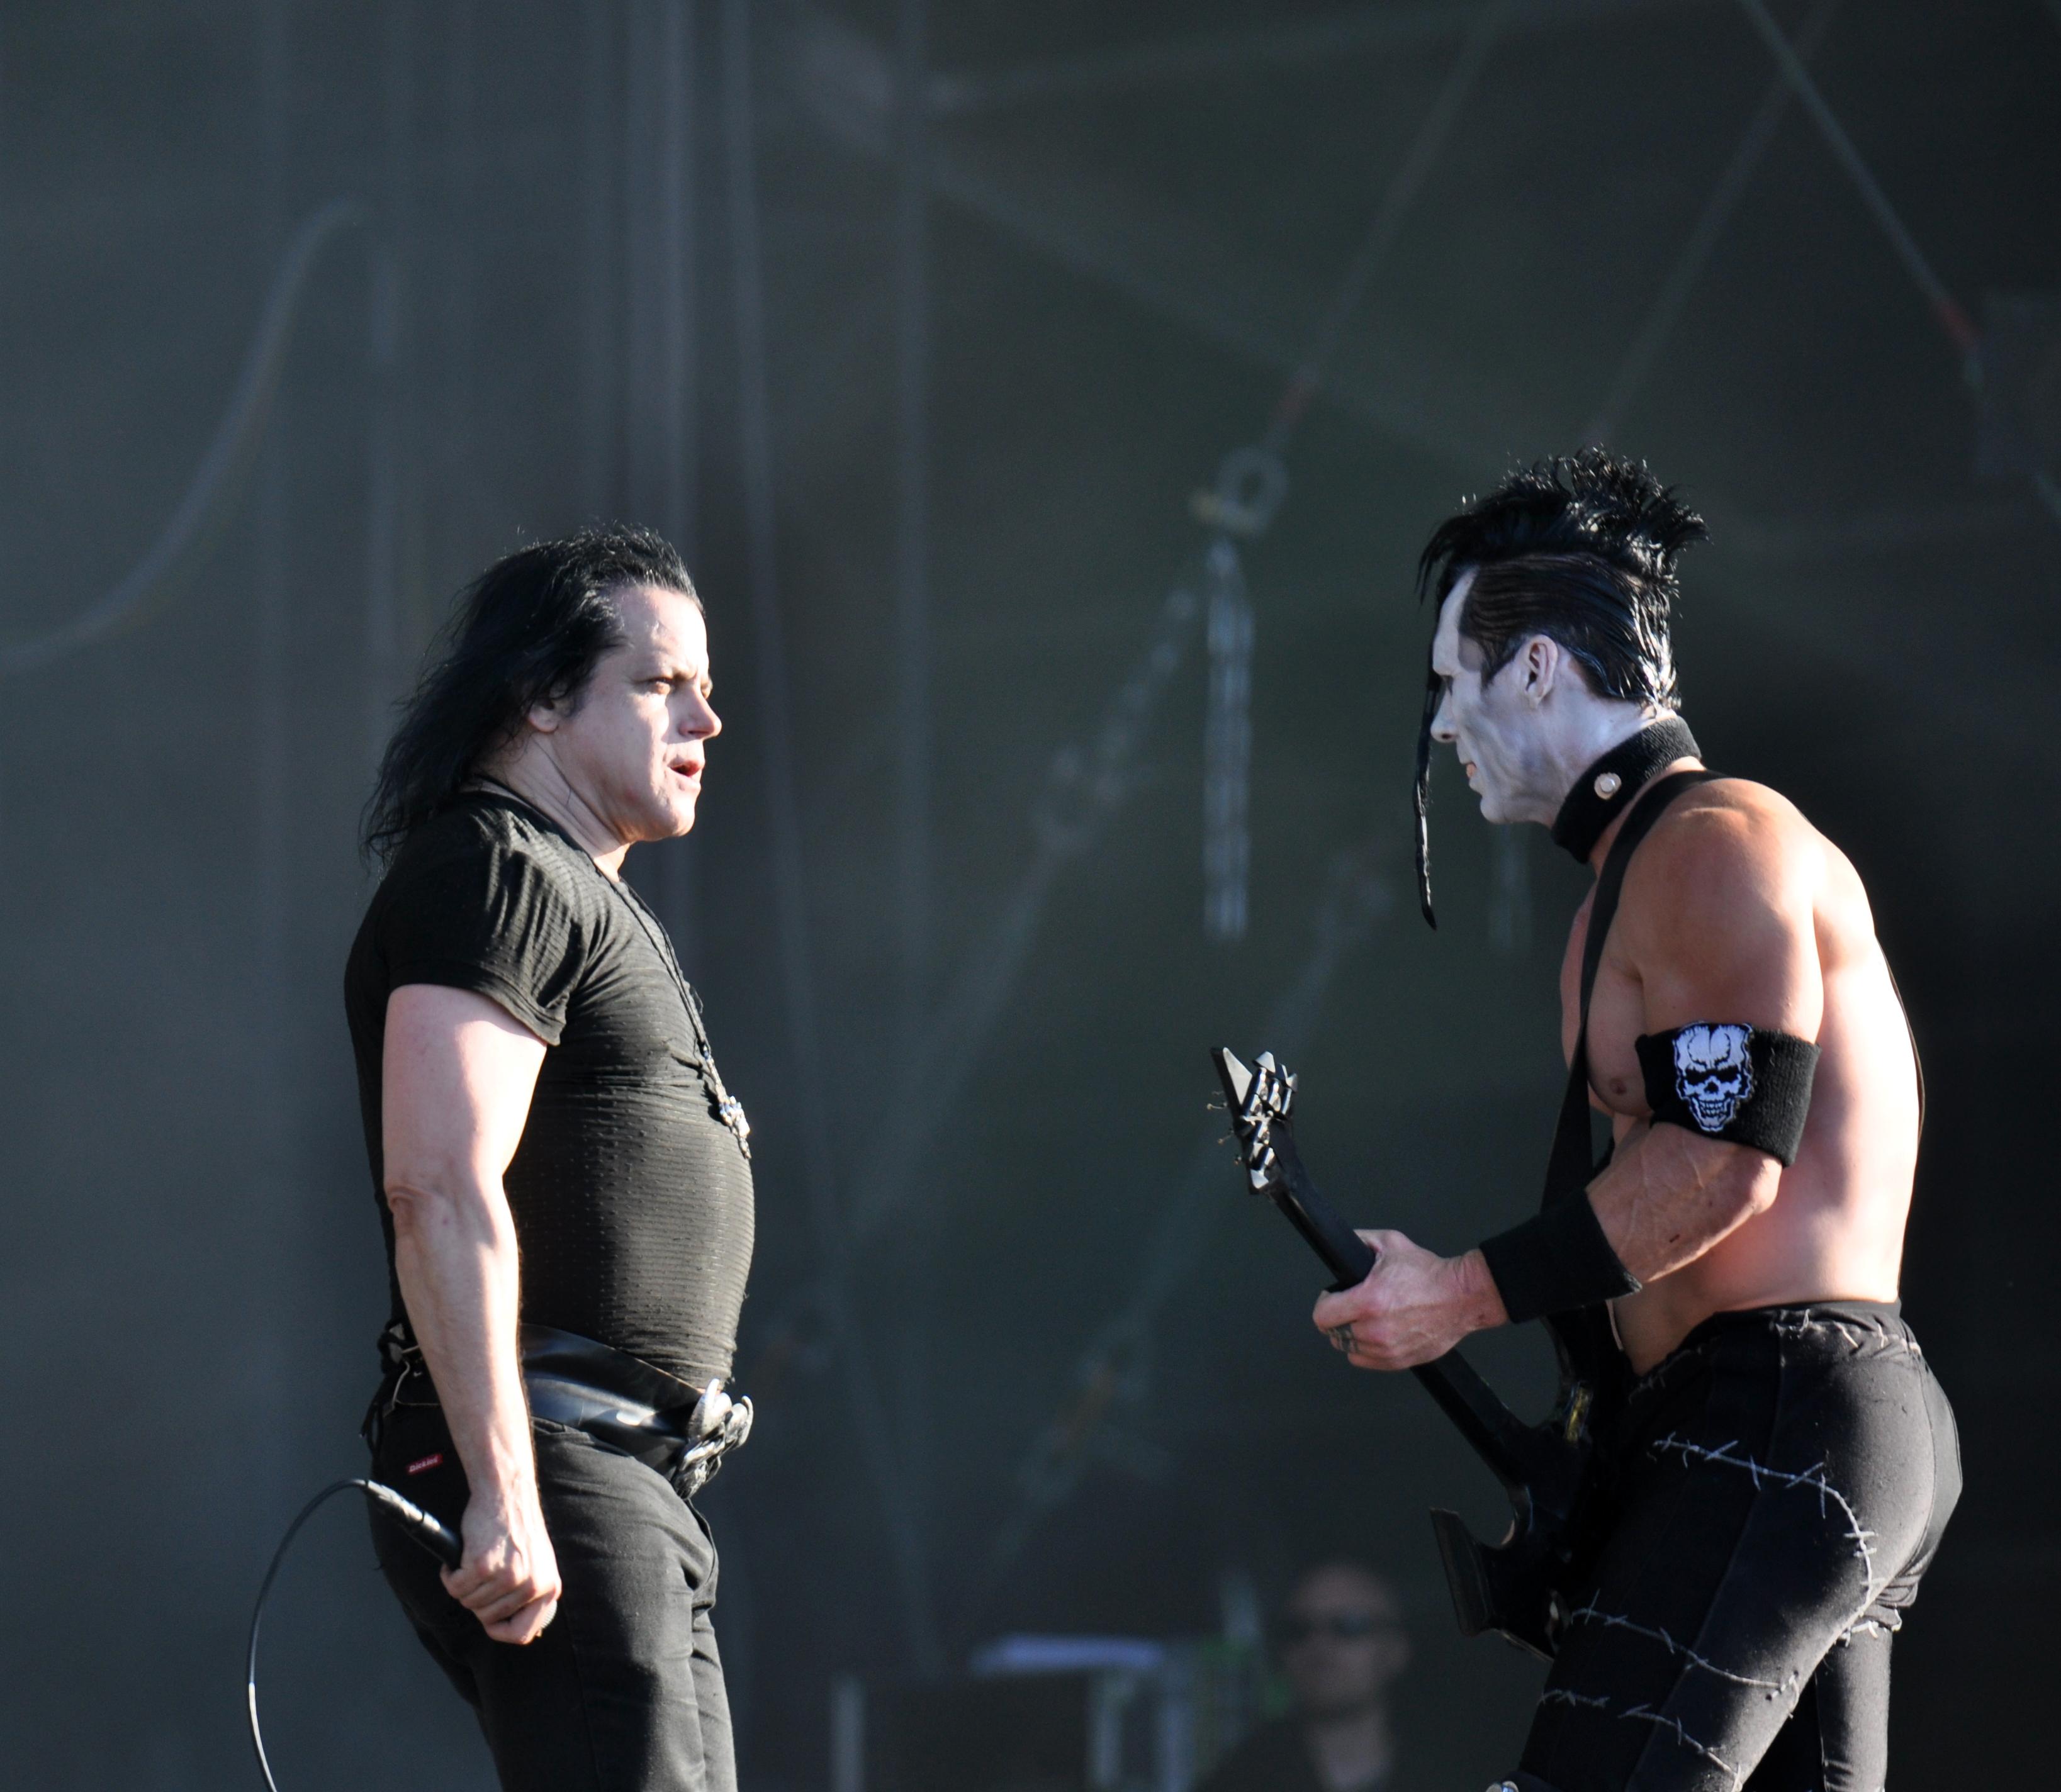 File:Glenn Danzig and Paul Doyle Caiafa playing at Wacken ...